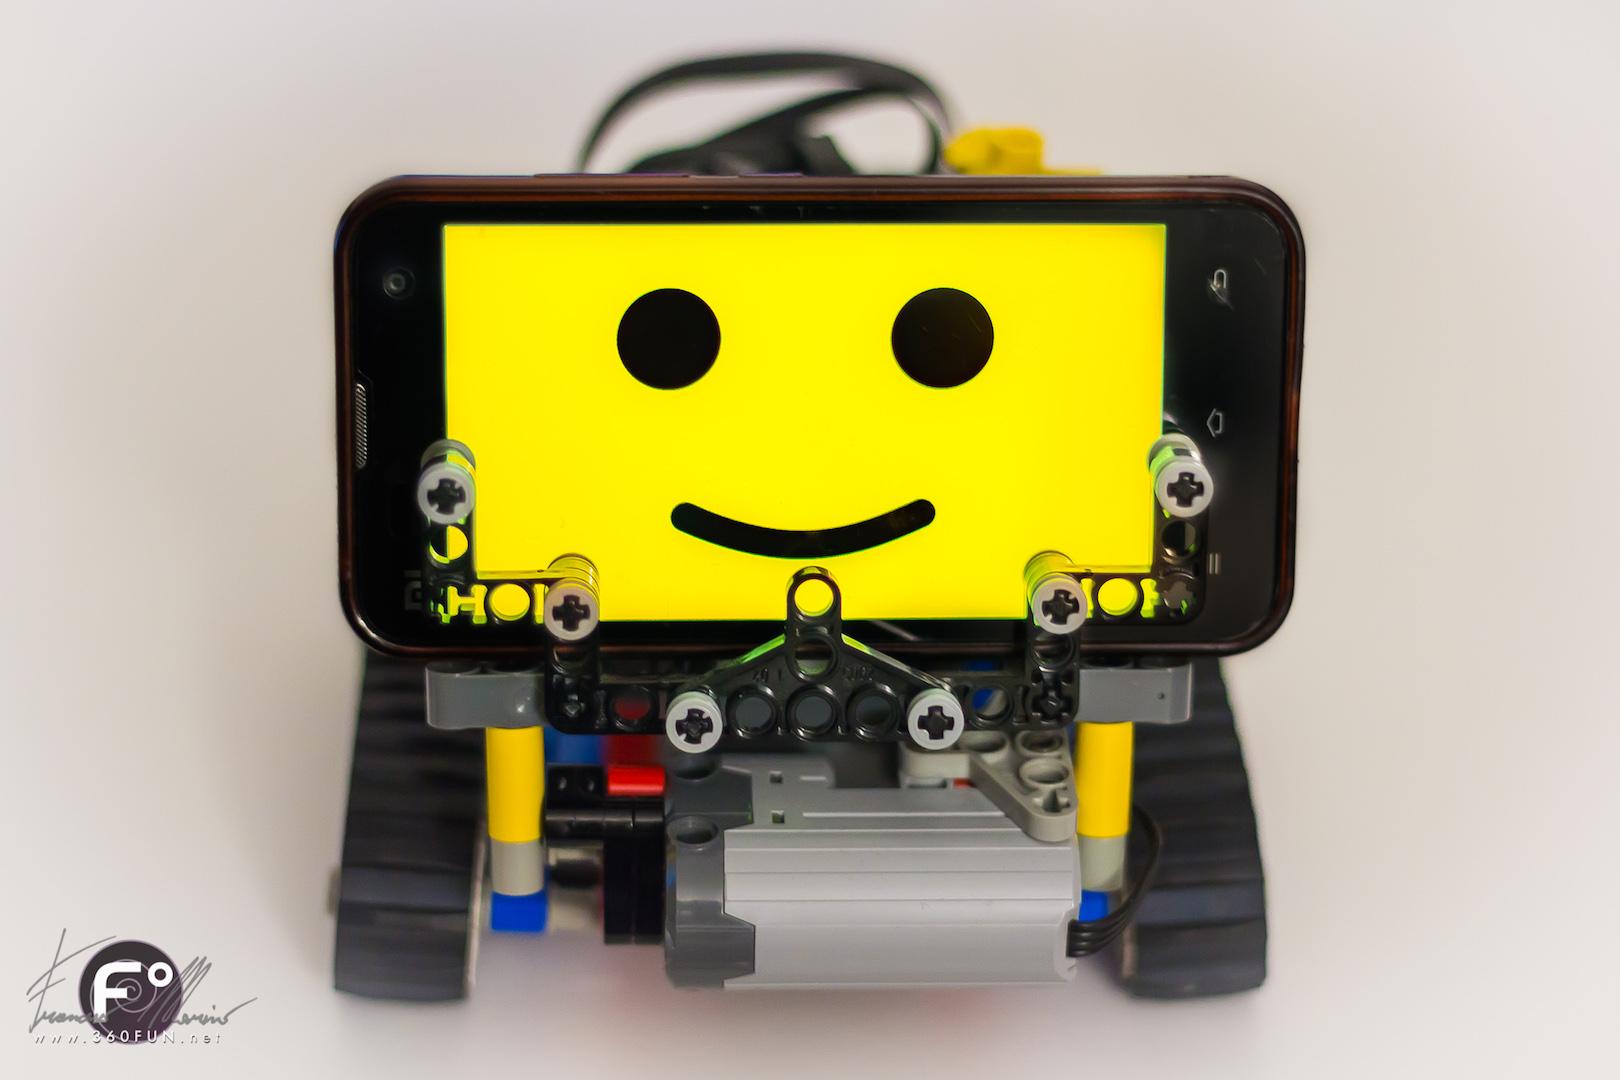 SBrick.js: Robotica semplificata grazie a LEGO, SBrick e Web Bluetooth